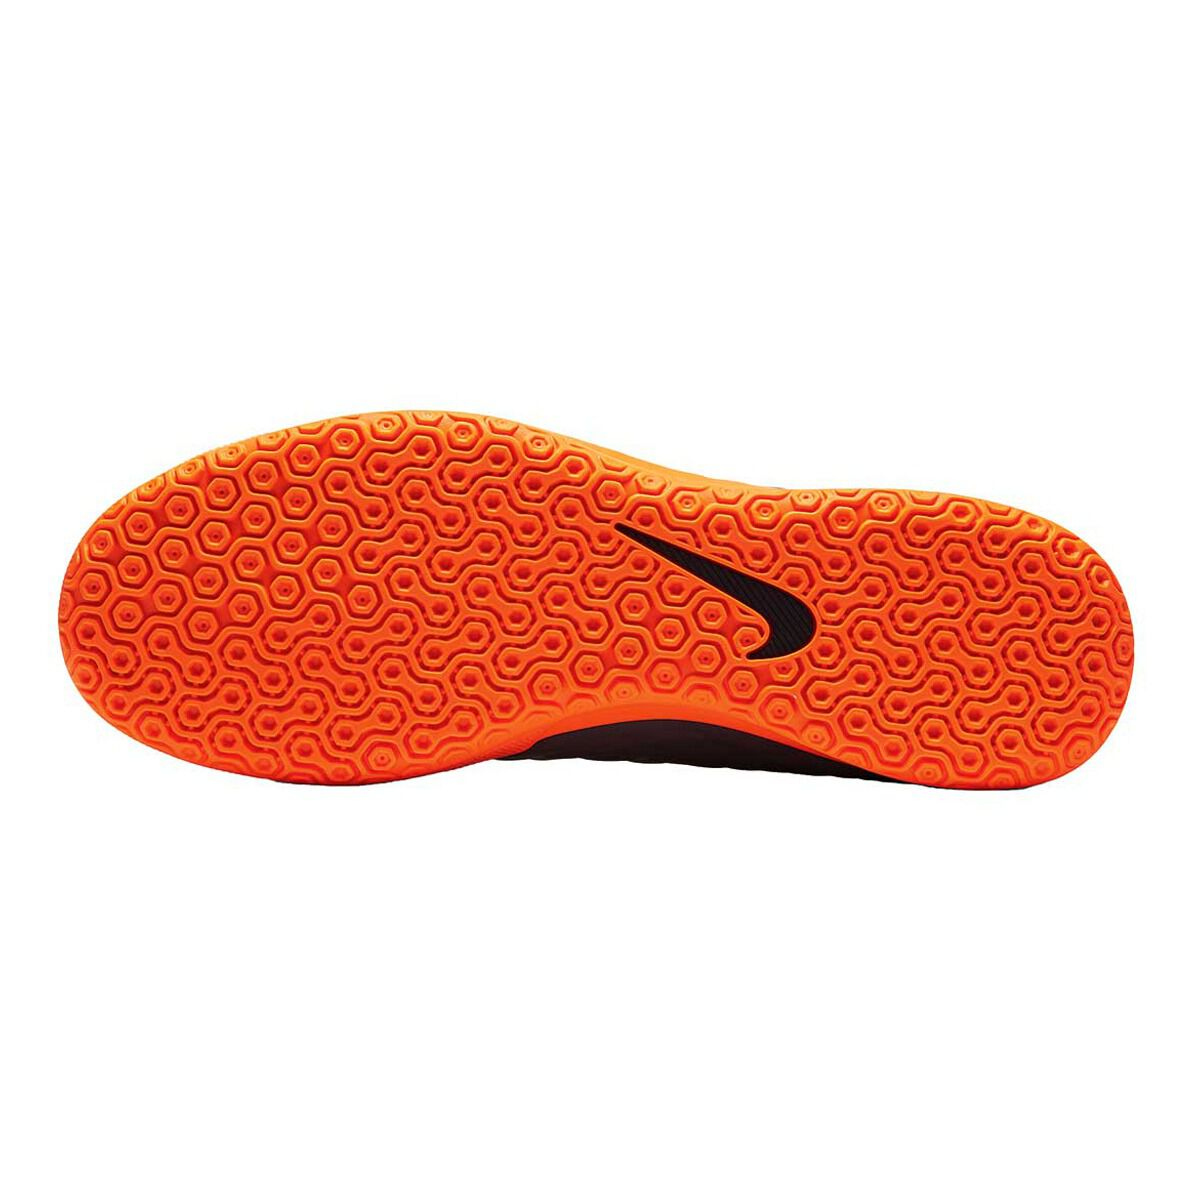 a7ad0ce1627 ... reduced nike hypervenom phantomx iii club mens indoor soccer shoes grey  orange us 11.5 adult 7d71b